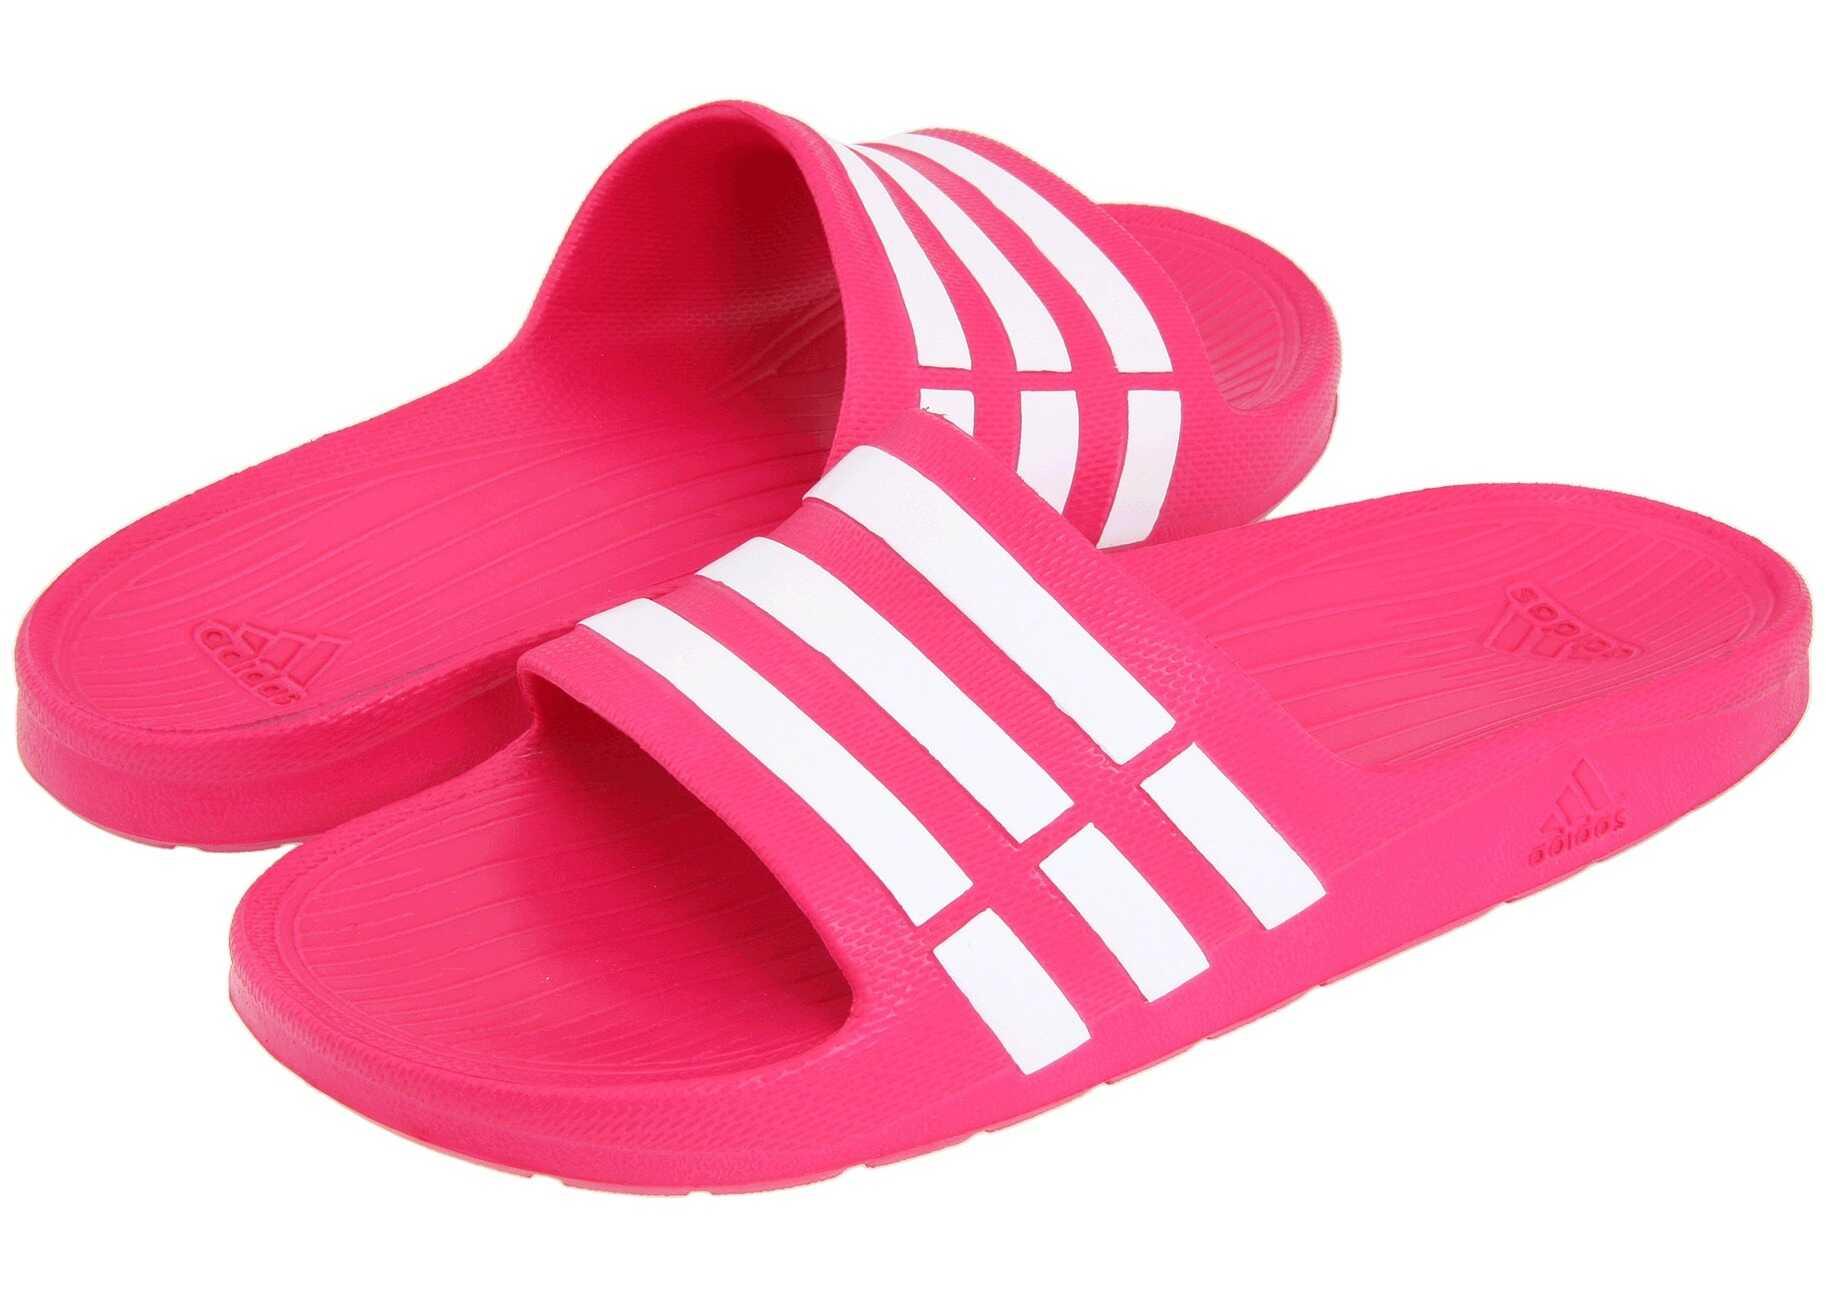 Adidas Kids Duramo Slide (Toddler/Little Kid/Big Kid) Pink Buzz/Running White/Pink Buzz